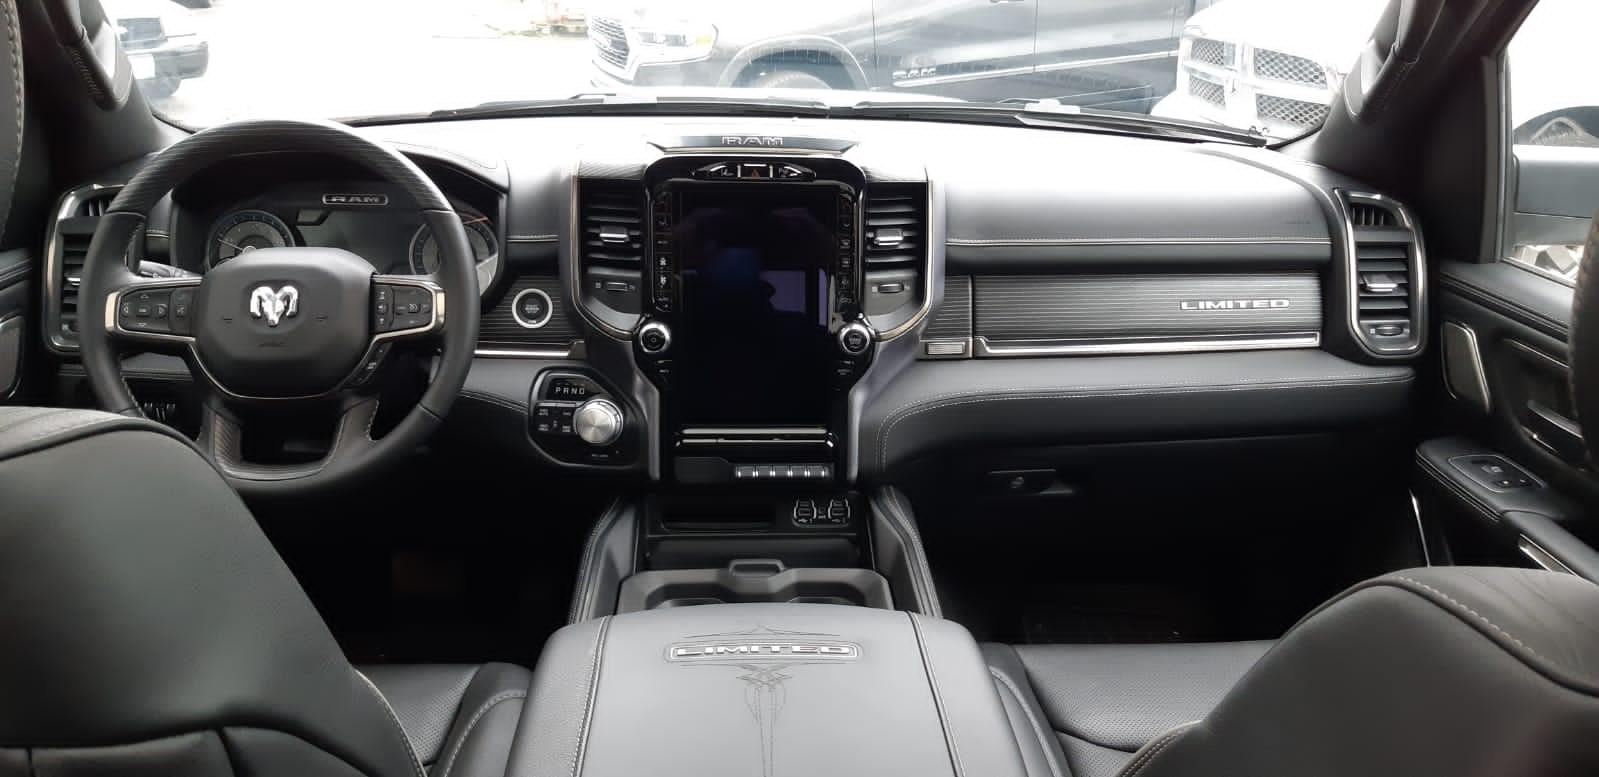 DODGE RAM 1500 limited 4x4 crew cab 5.7l hemi 395hp dualtailgate